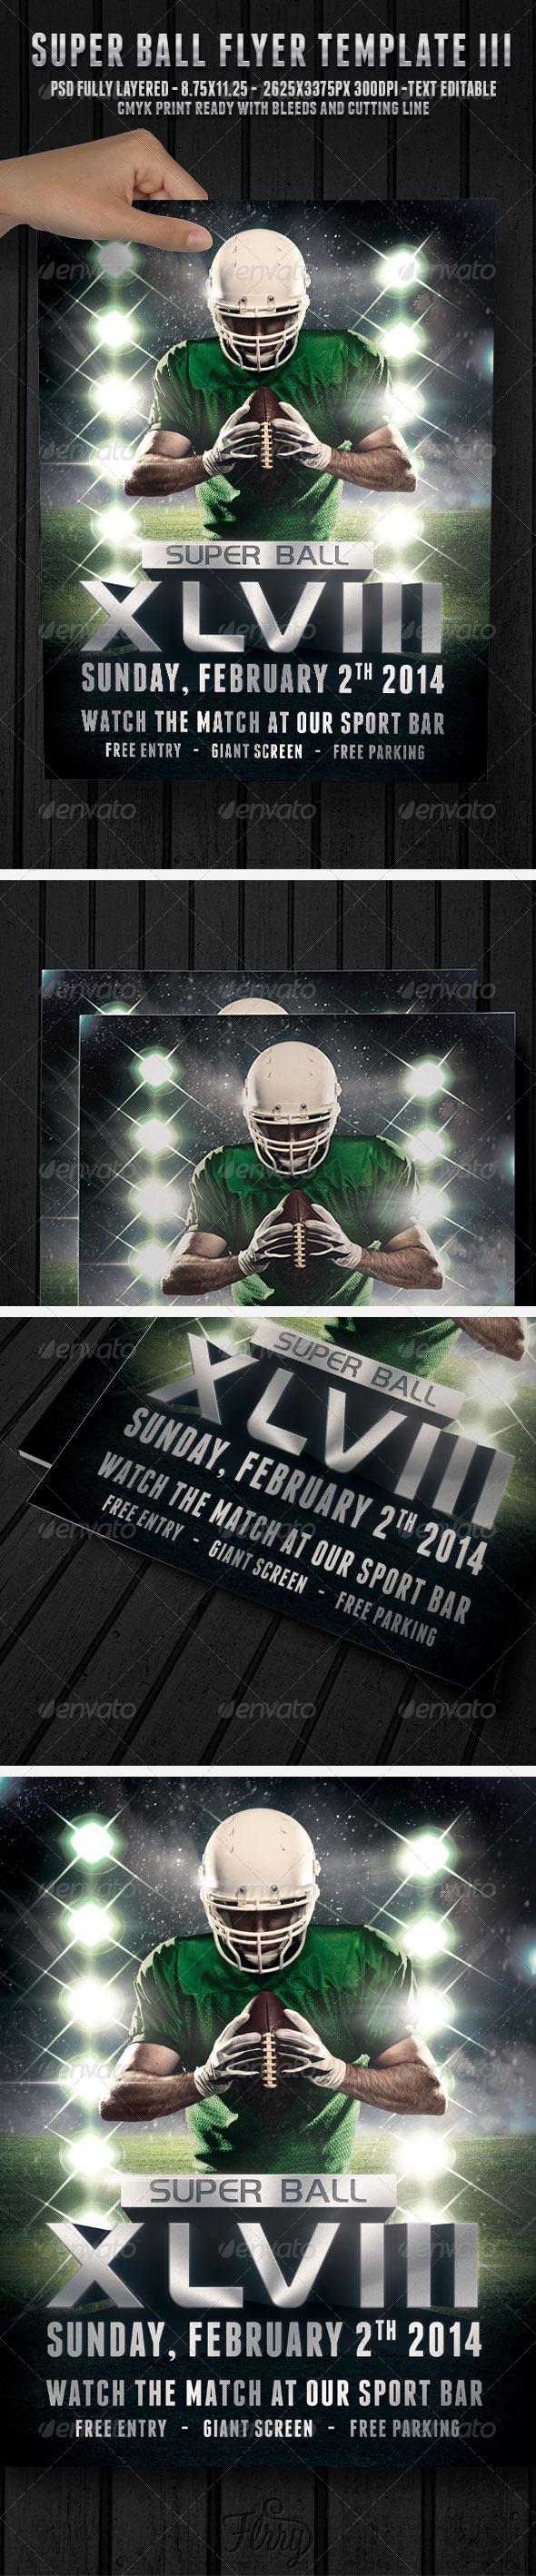 GraphicRiver Super Ball Football 3 Flyer Template 6678657